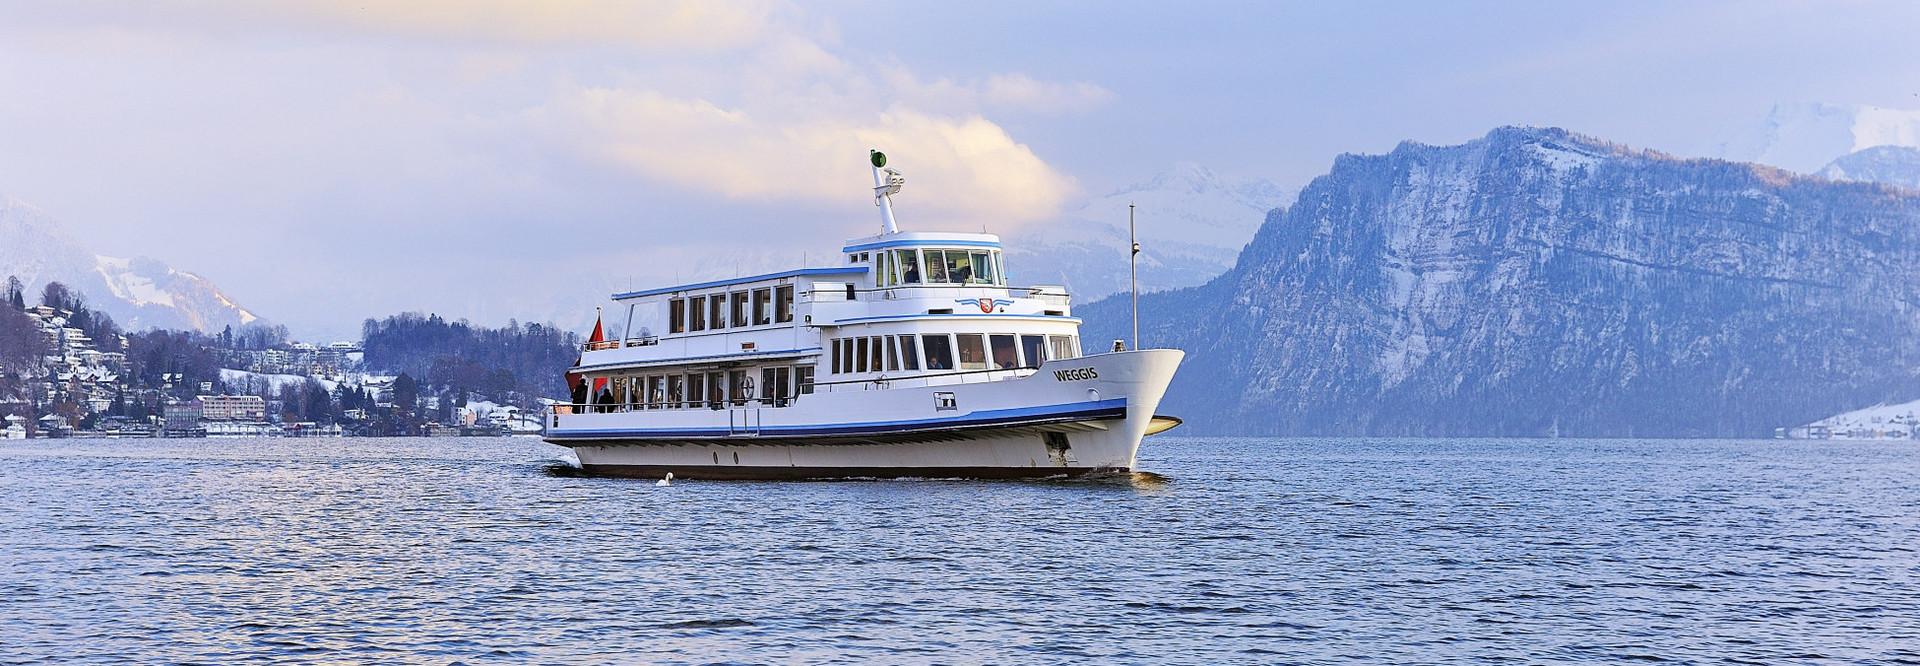 Motor ship on Lake Lucerne in winter.